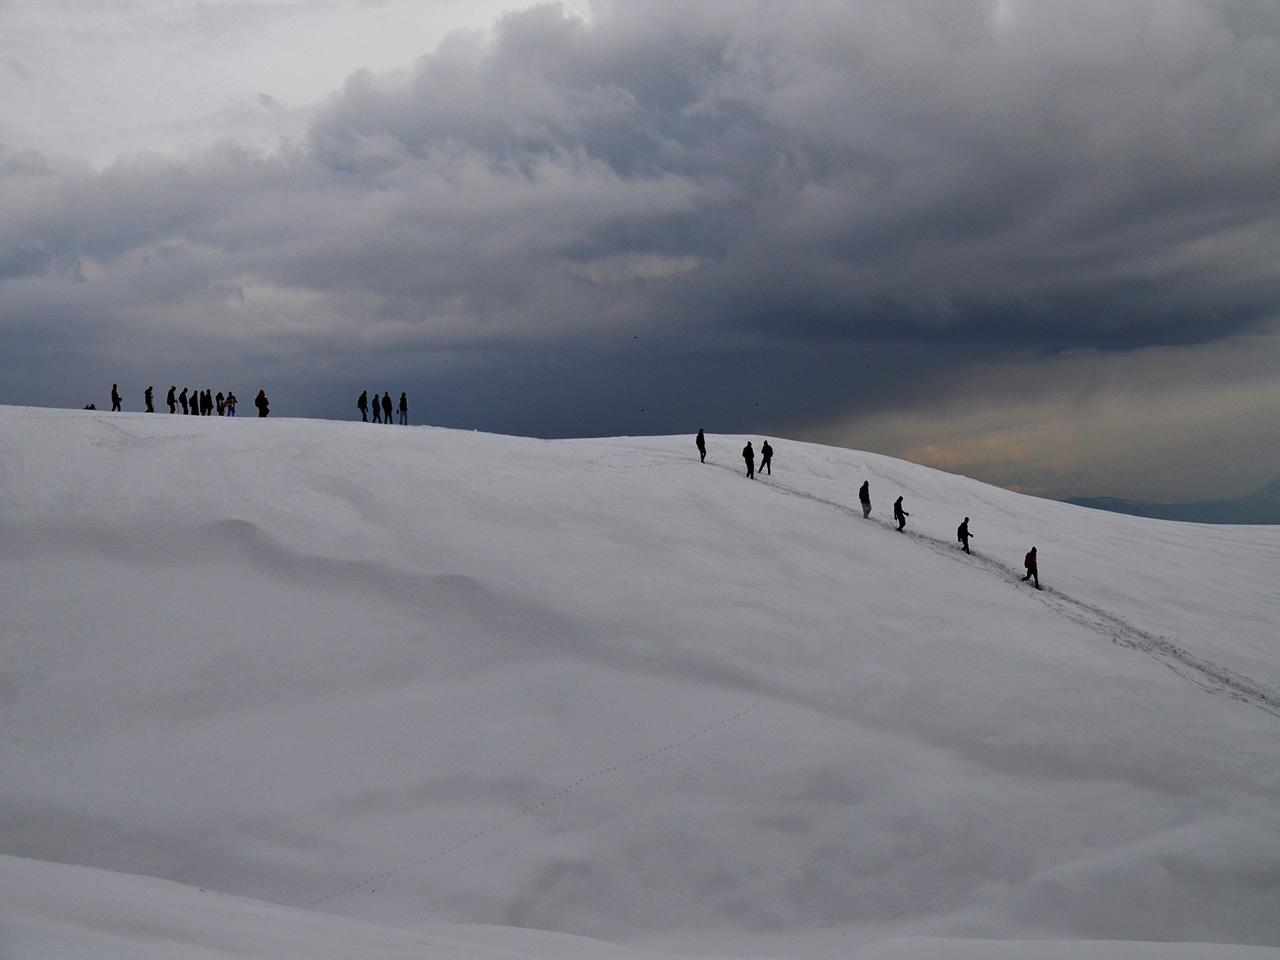 Mushkpuri-Peak-Donga-Gali-Nathia-Gali